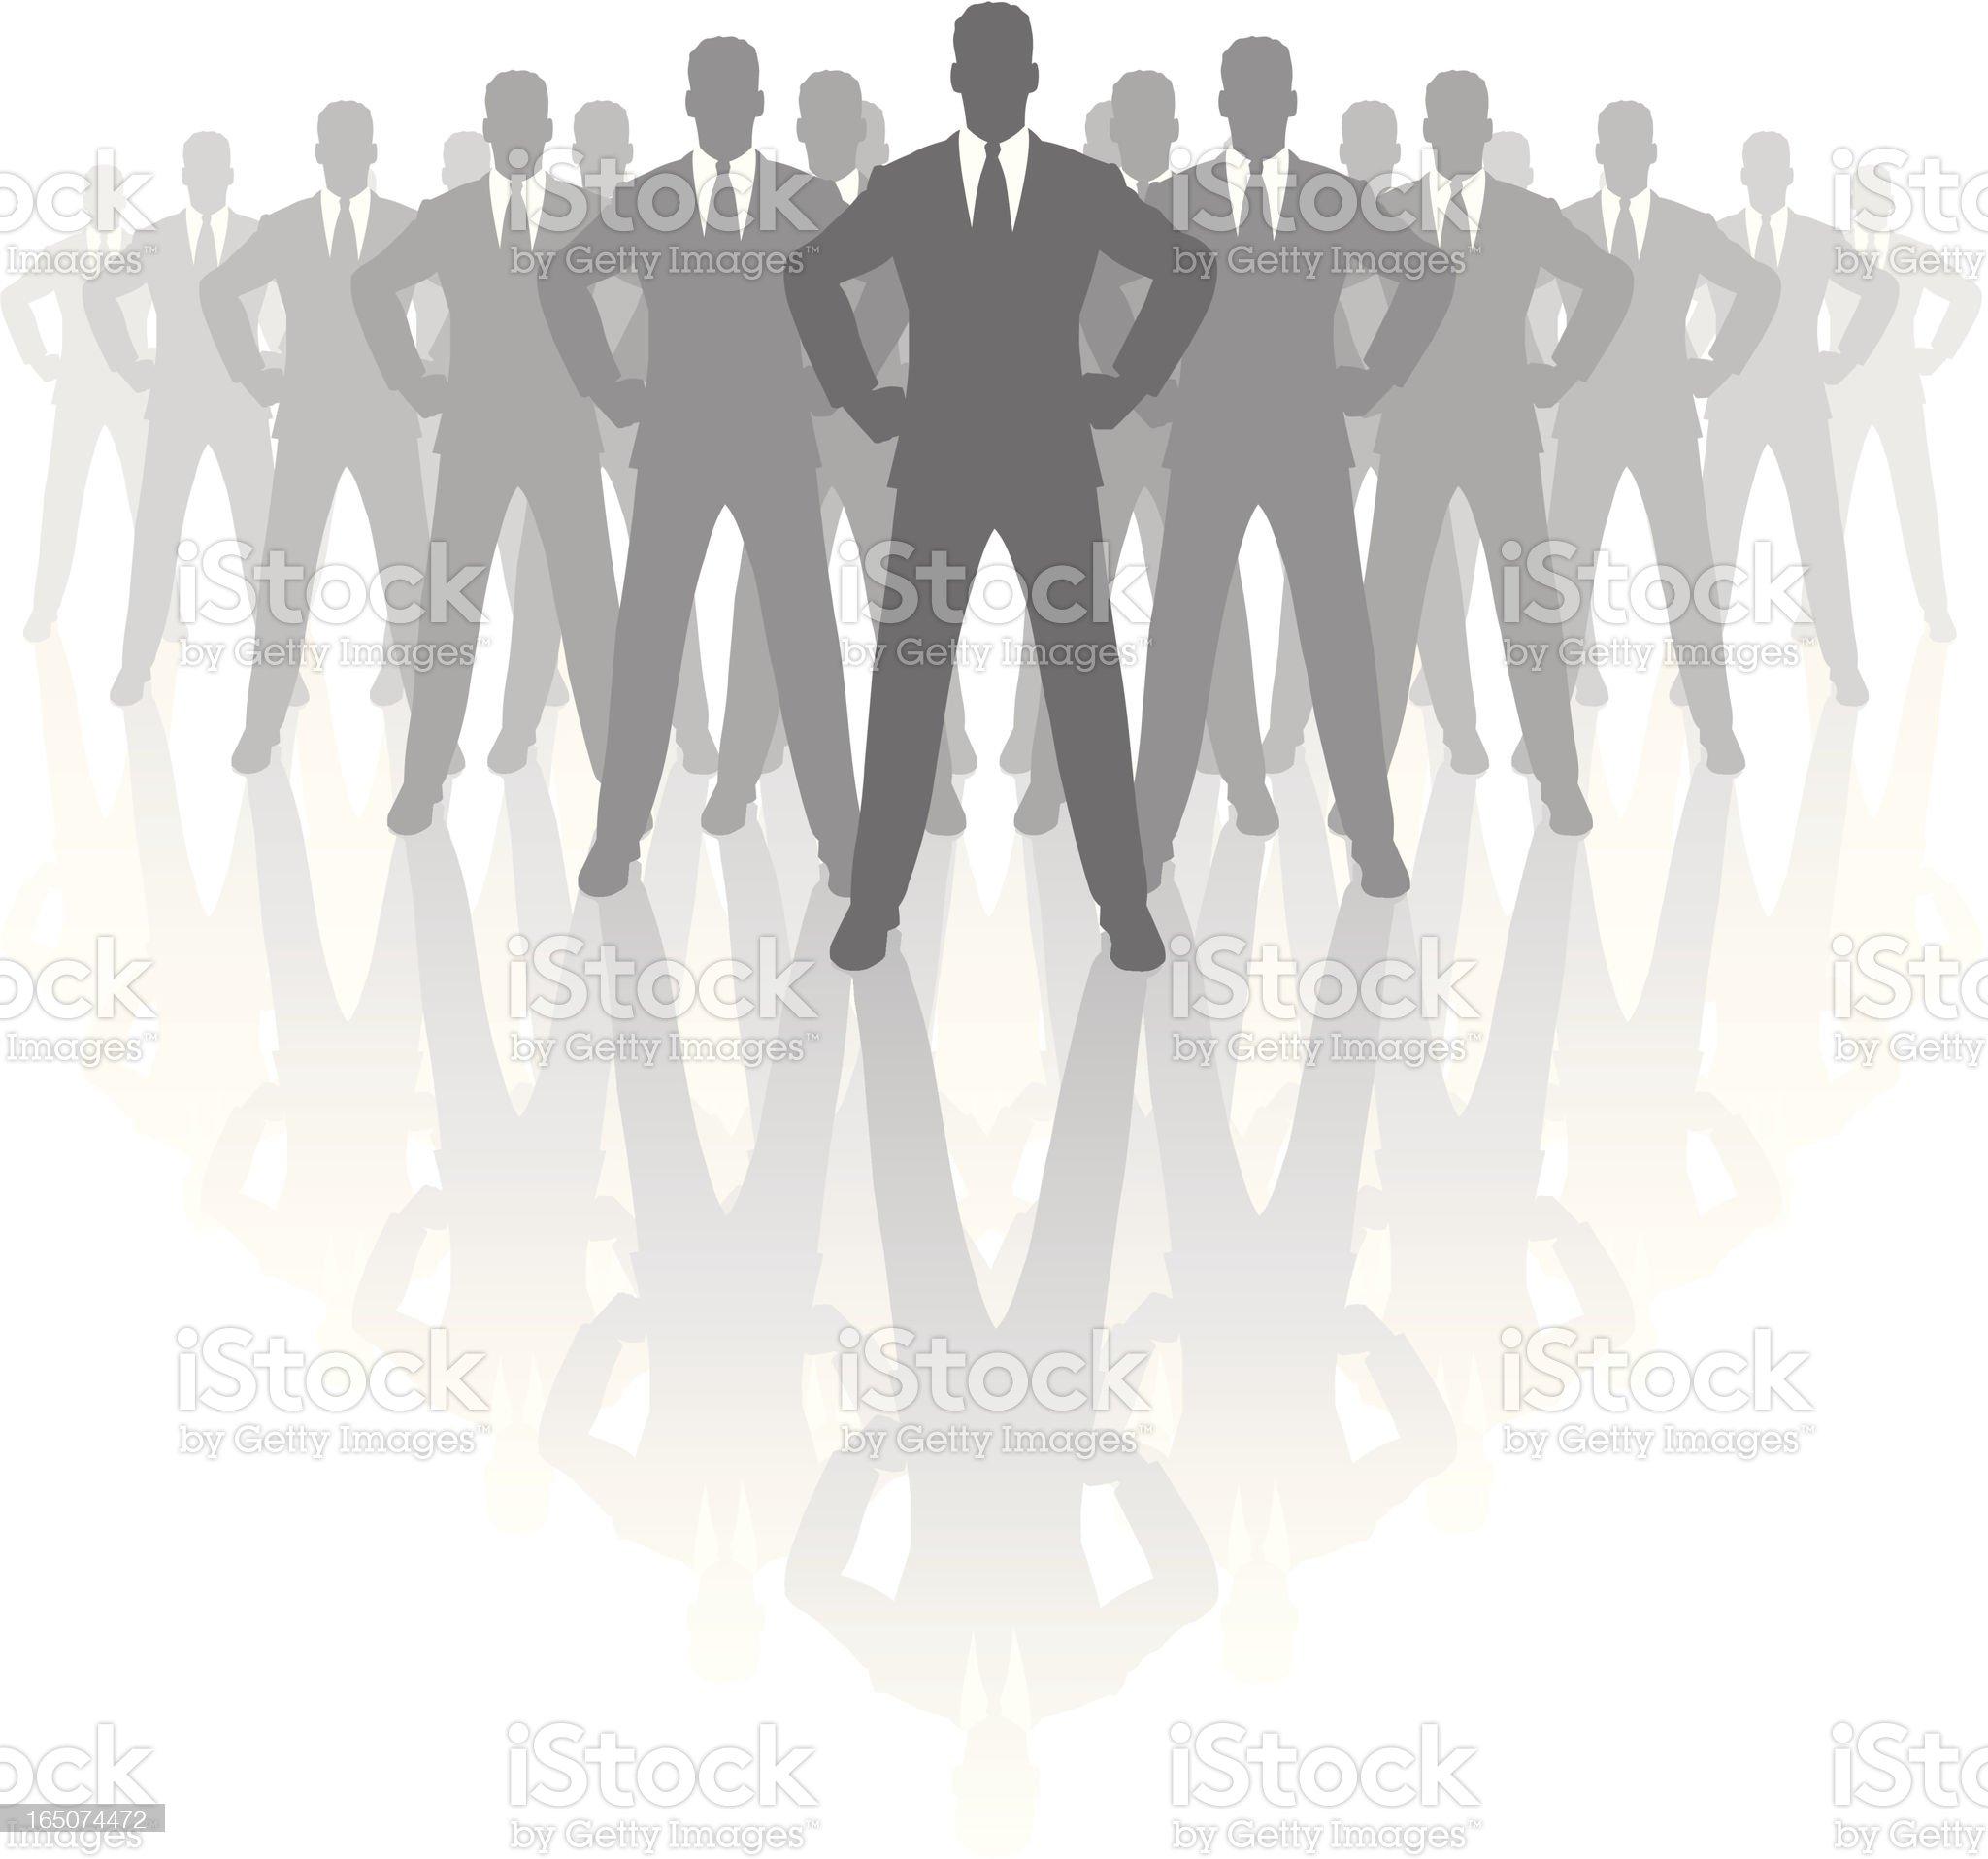 The boss. royalty-free stock vector art